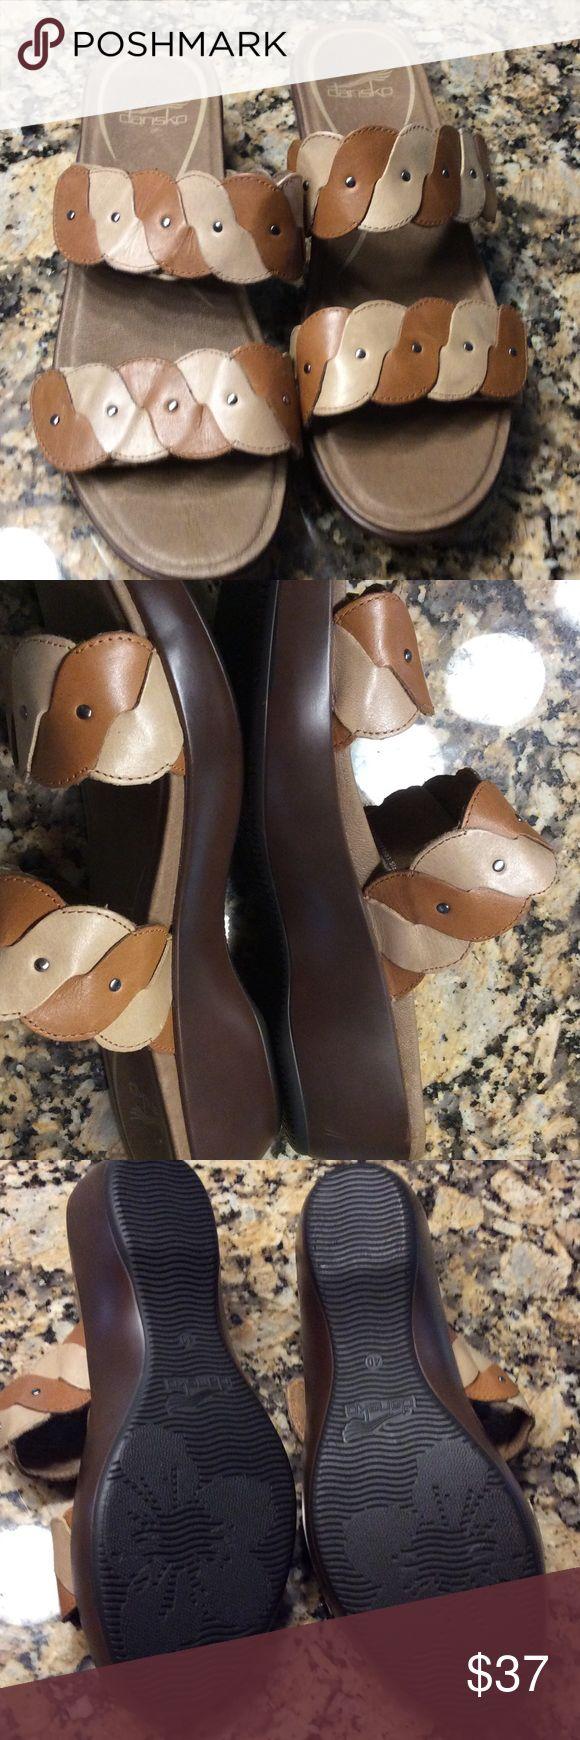 Dansko platform sandals.  NWOT ❤️WEEKEND SALE❤️ Very nice brown two-tone sandals.  Both straps are Velcro adjustable. 072705 Dansko Shoes Platforms